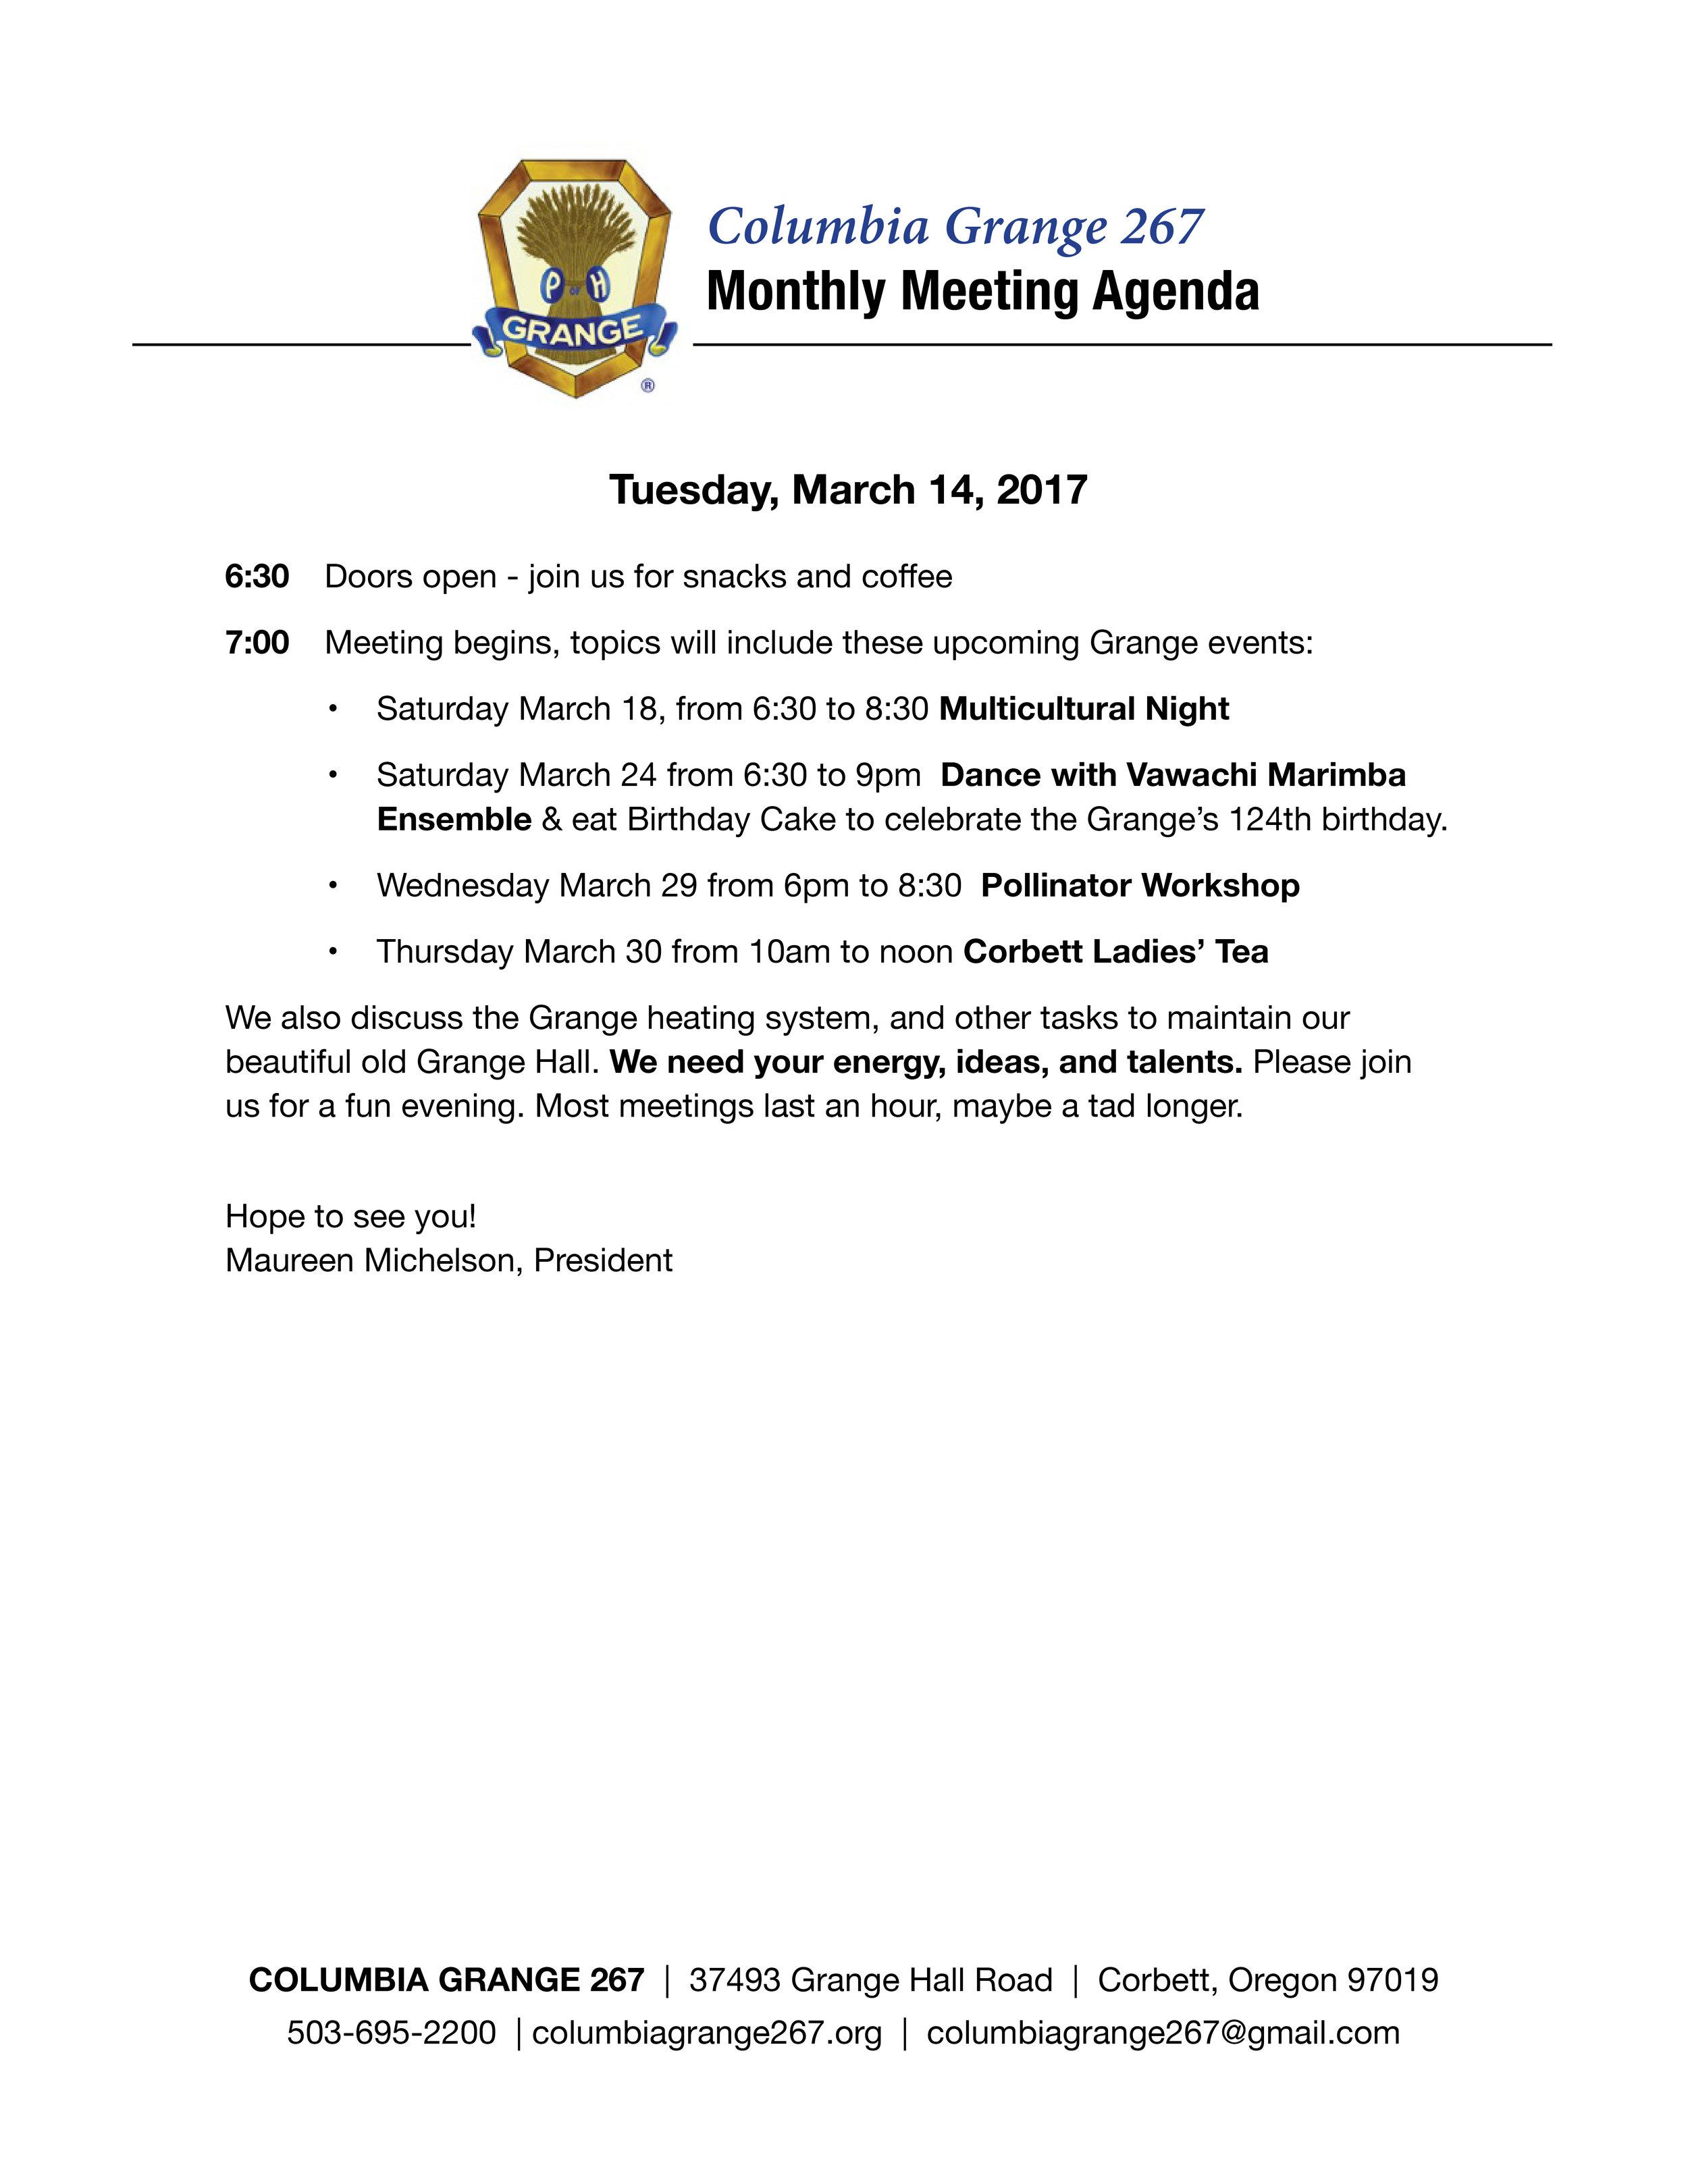 Meeting Agenda Form.jpg